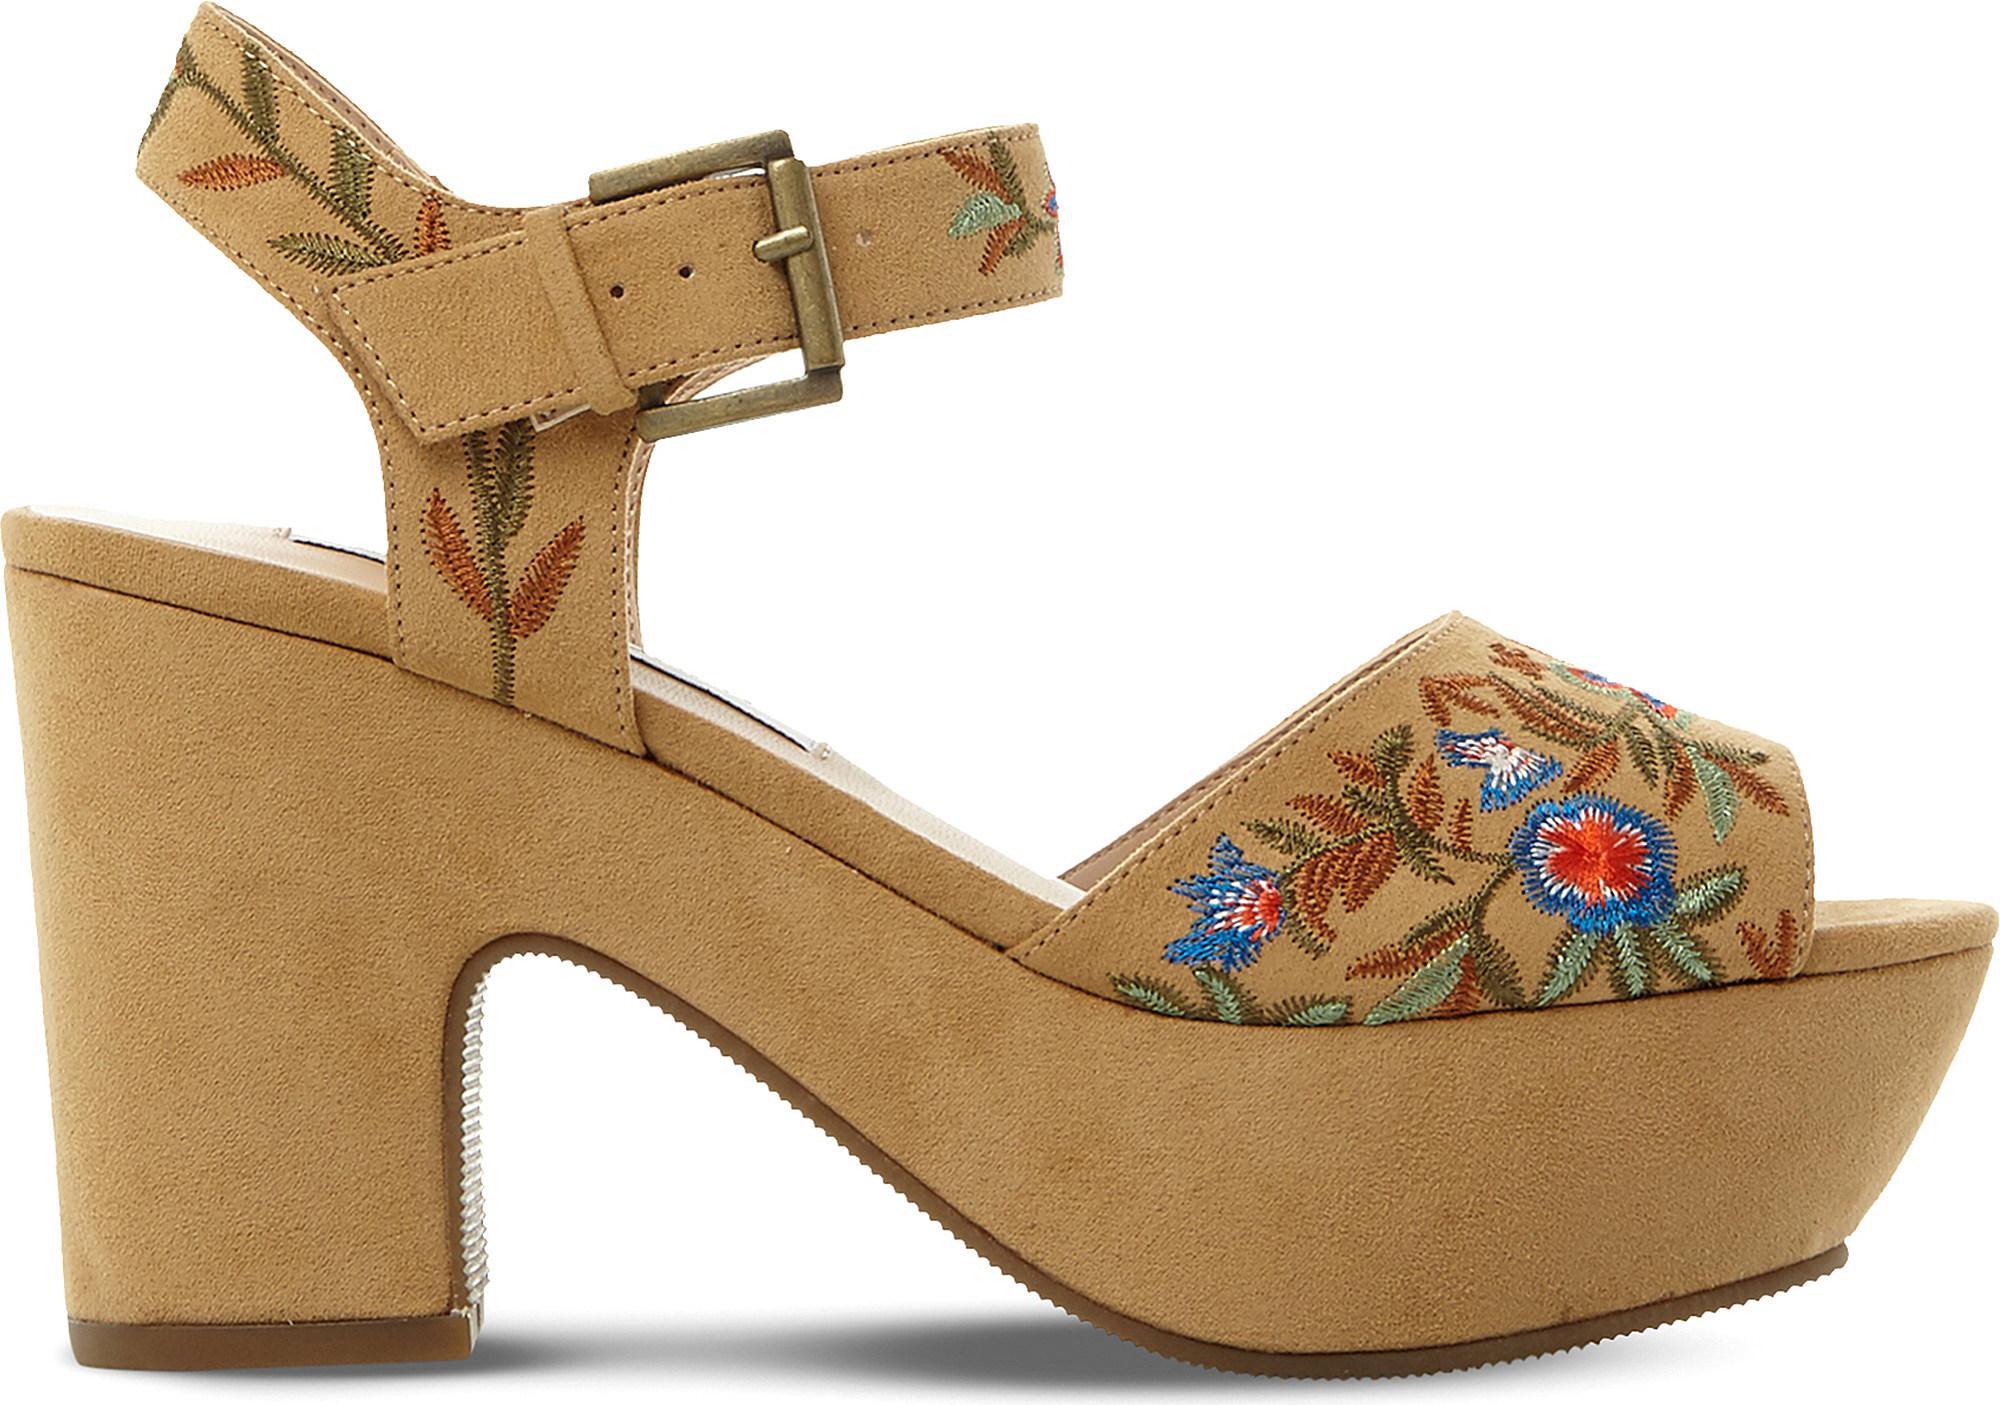 66dc5539067a Steve Madden - Multicolor Bonnie Embroidered Platform Sandals - Lyst